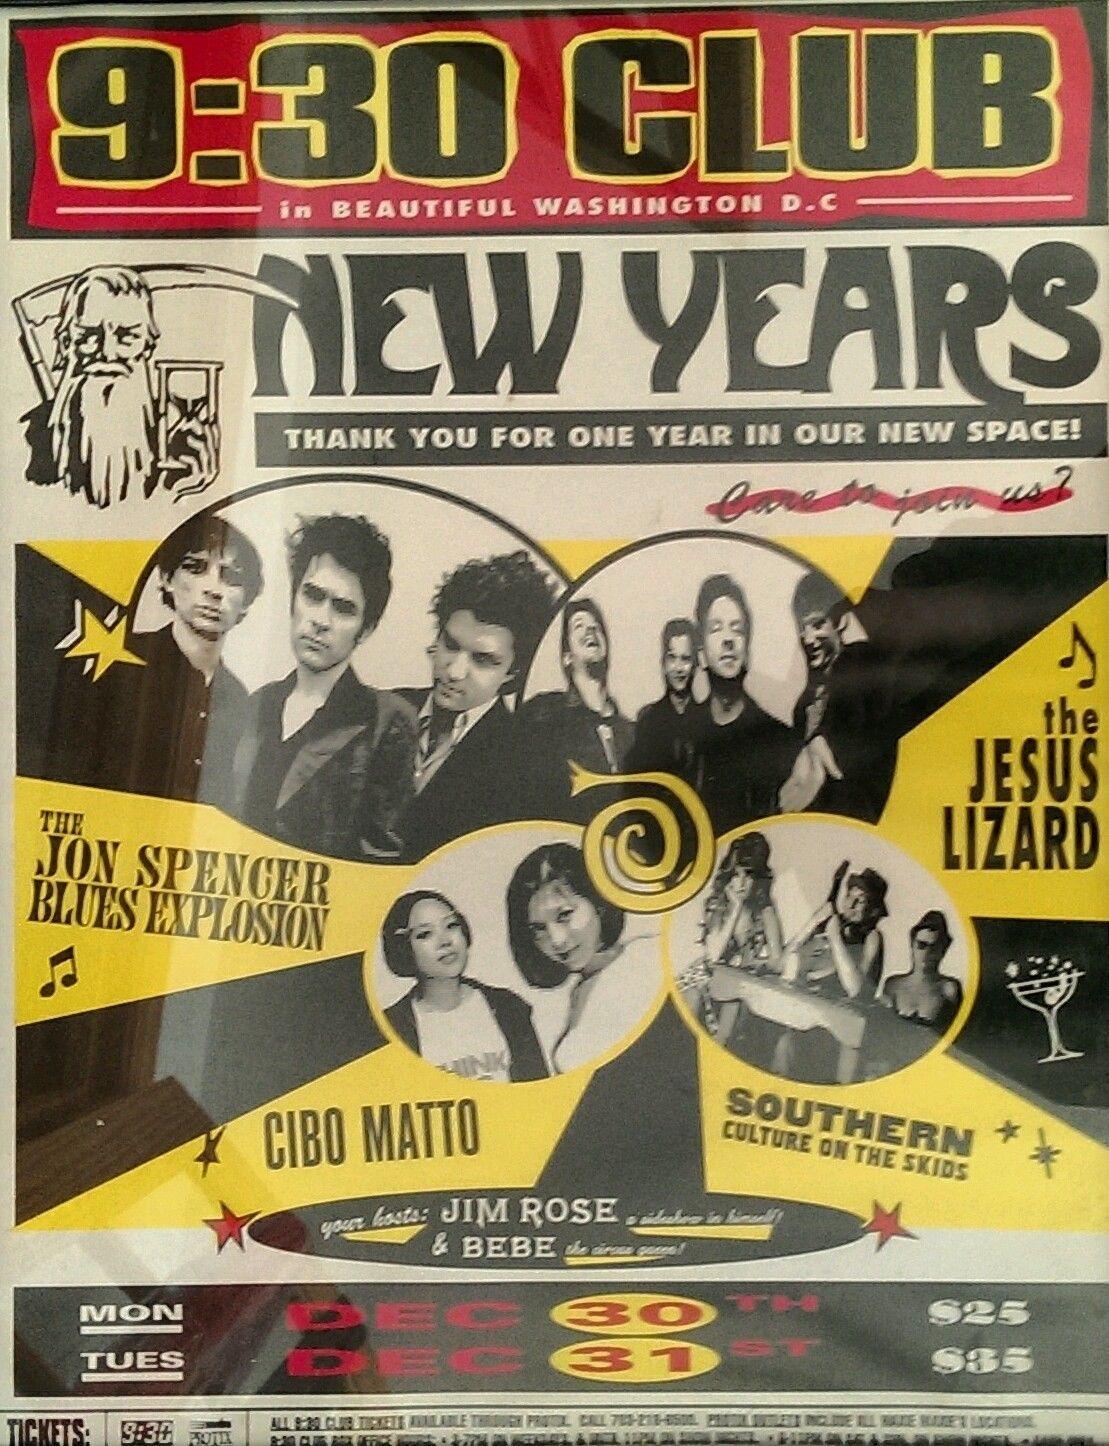 The Jon Spencer Blues Explosion - 9:30 Club, Washington, DC, US (30/31 December 1996)